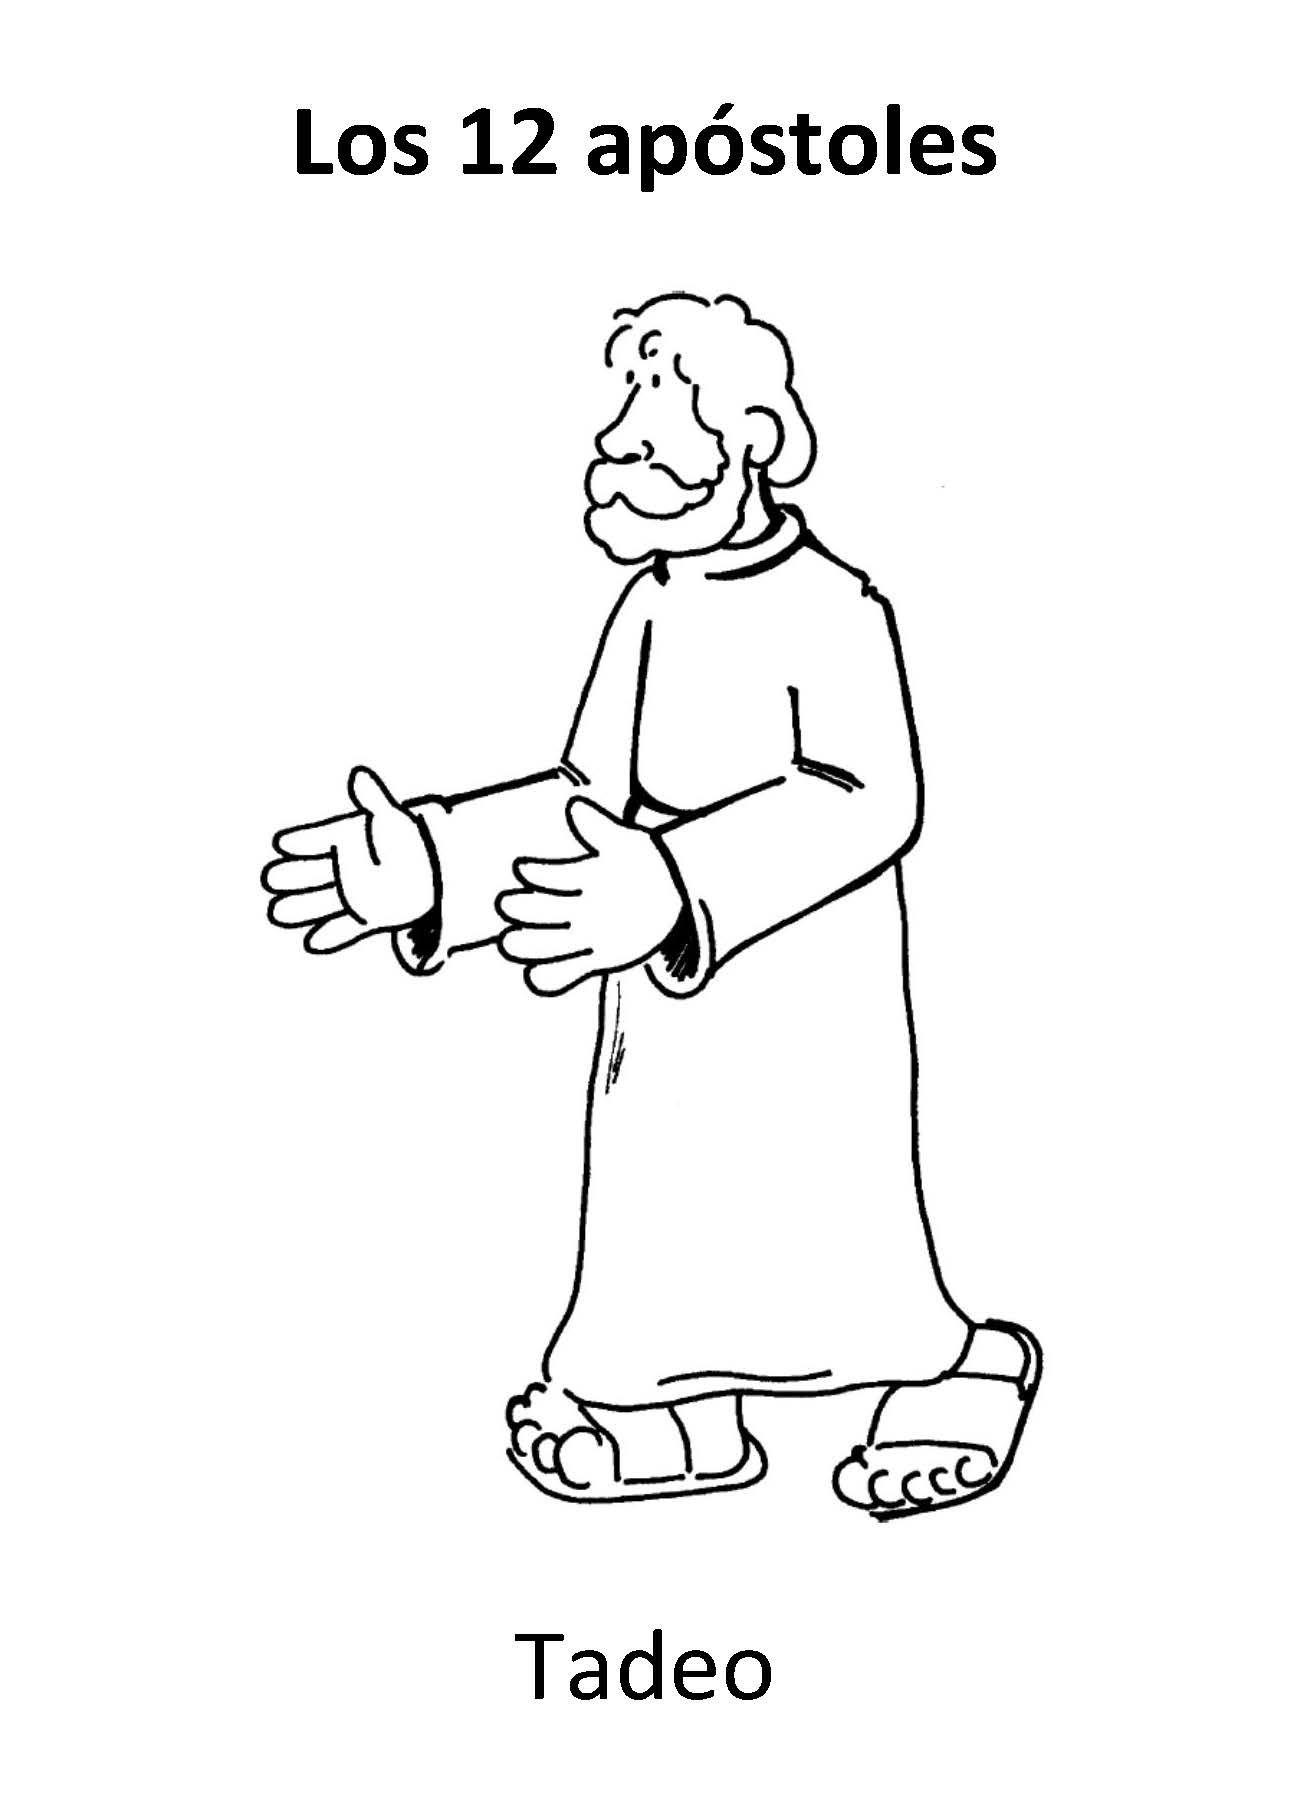 Tadeo More | Dibujos Biblicos | Pinterest | Bible, Sunday school and …